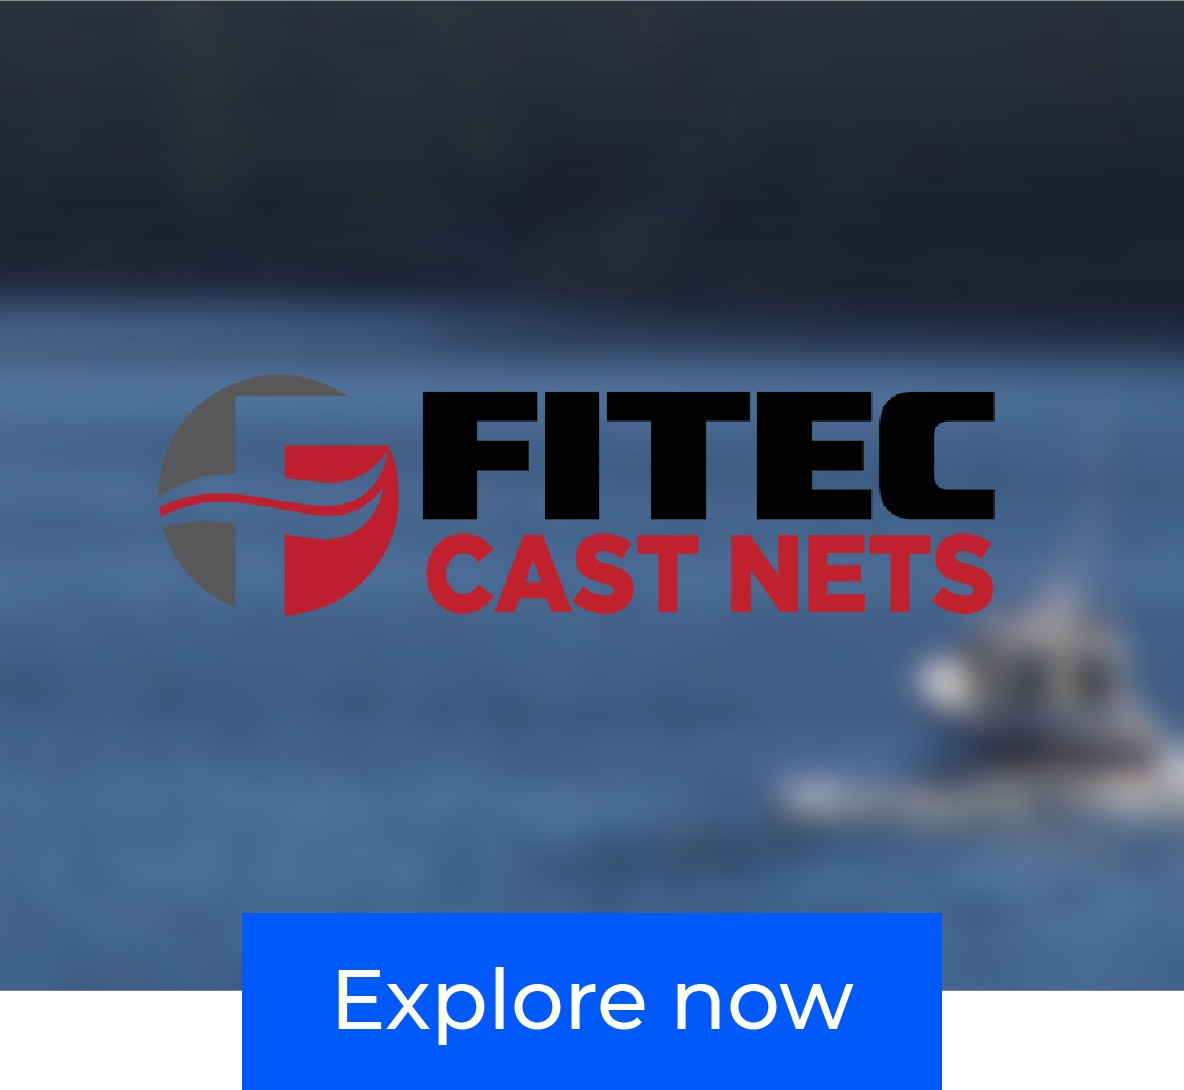 Fitec cast nets